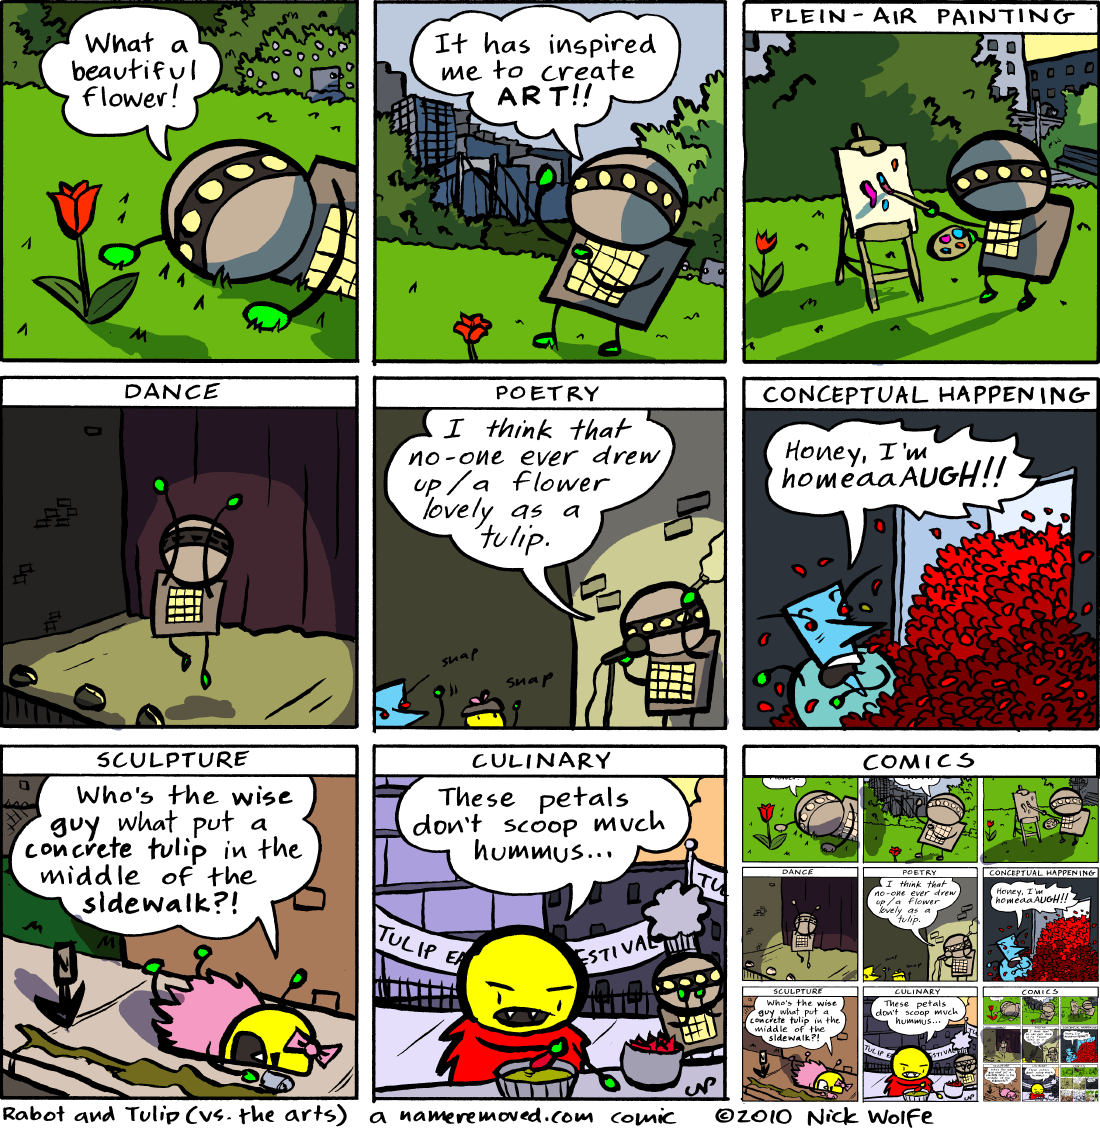 Rabot and Tulip (vs. the arts)